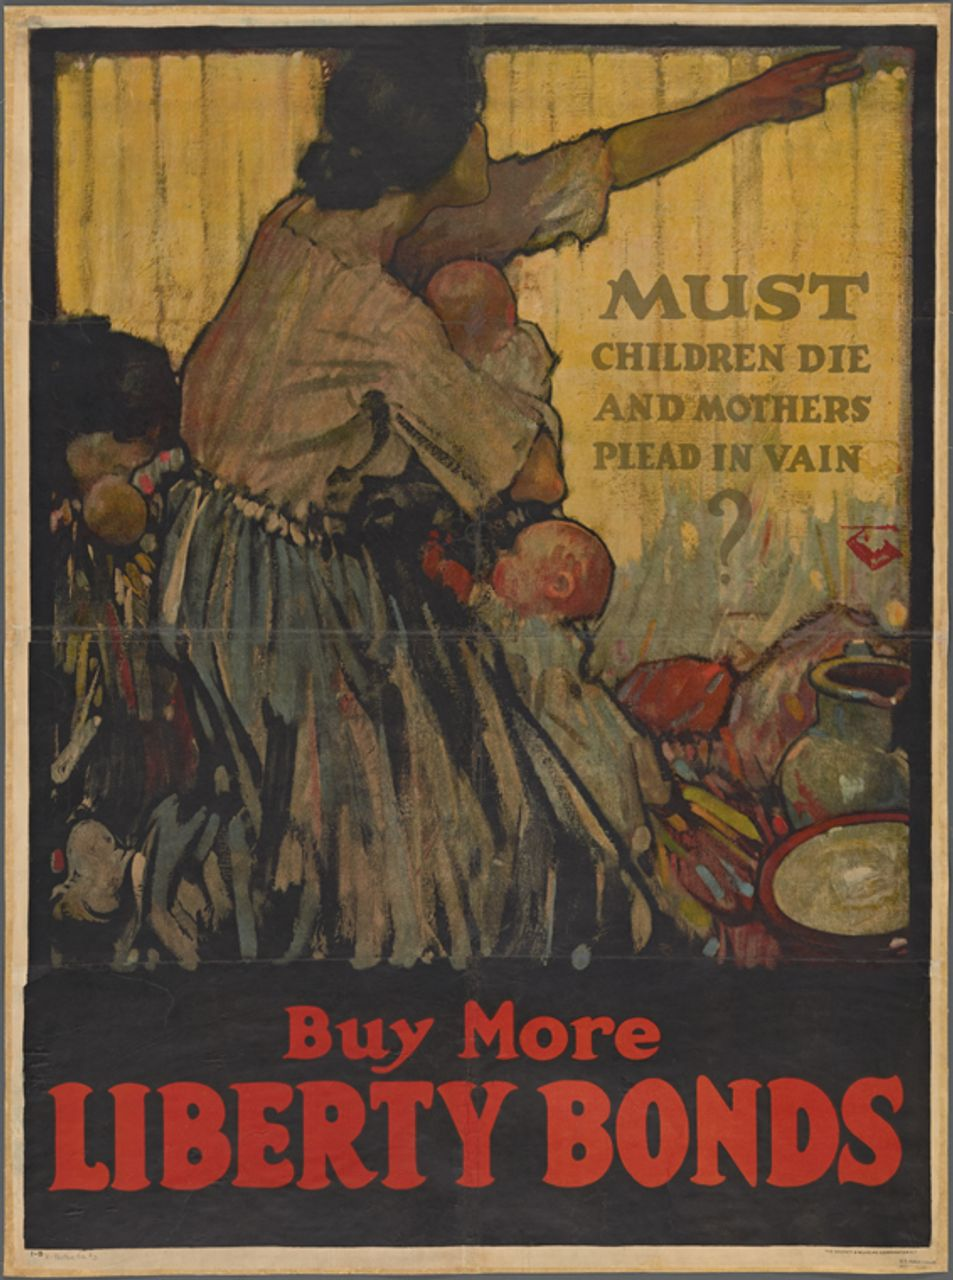 'Must children die and mothers plead in vain? Buy more Liberty Bonds,' 1918